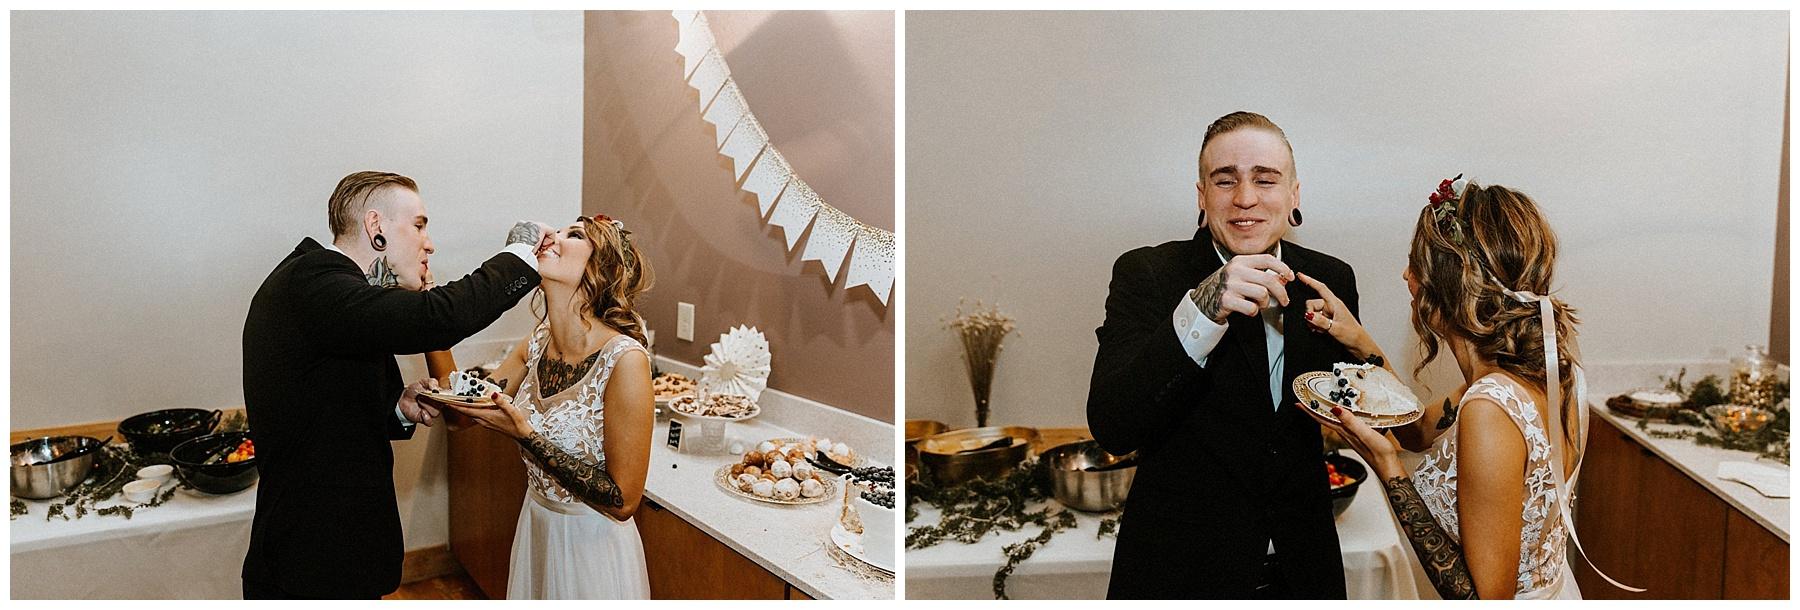 Georgia Wedding Tampa Wedding Photographer-132.jpg